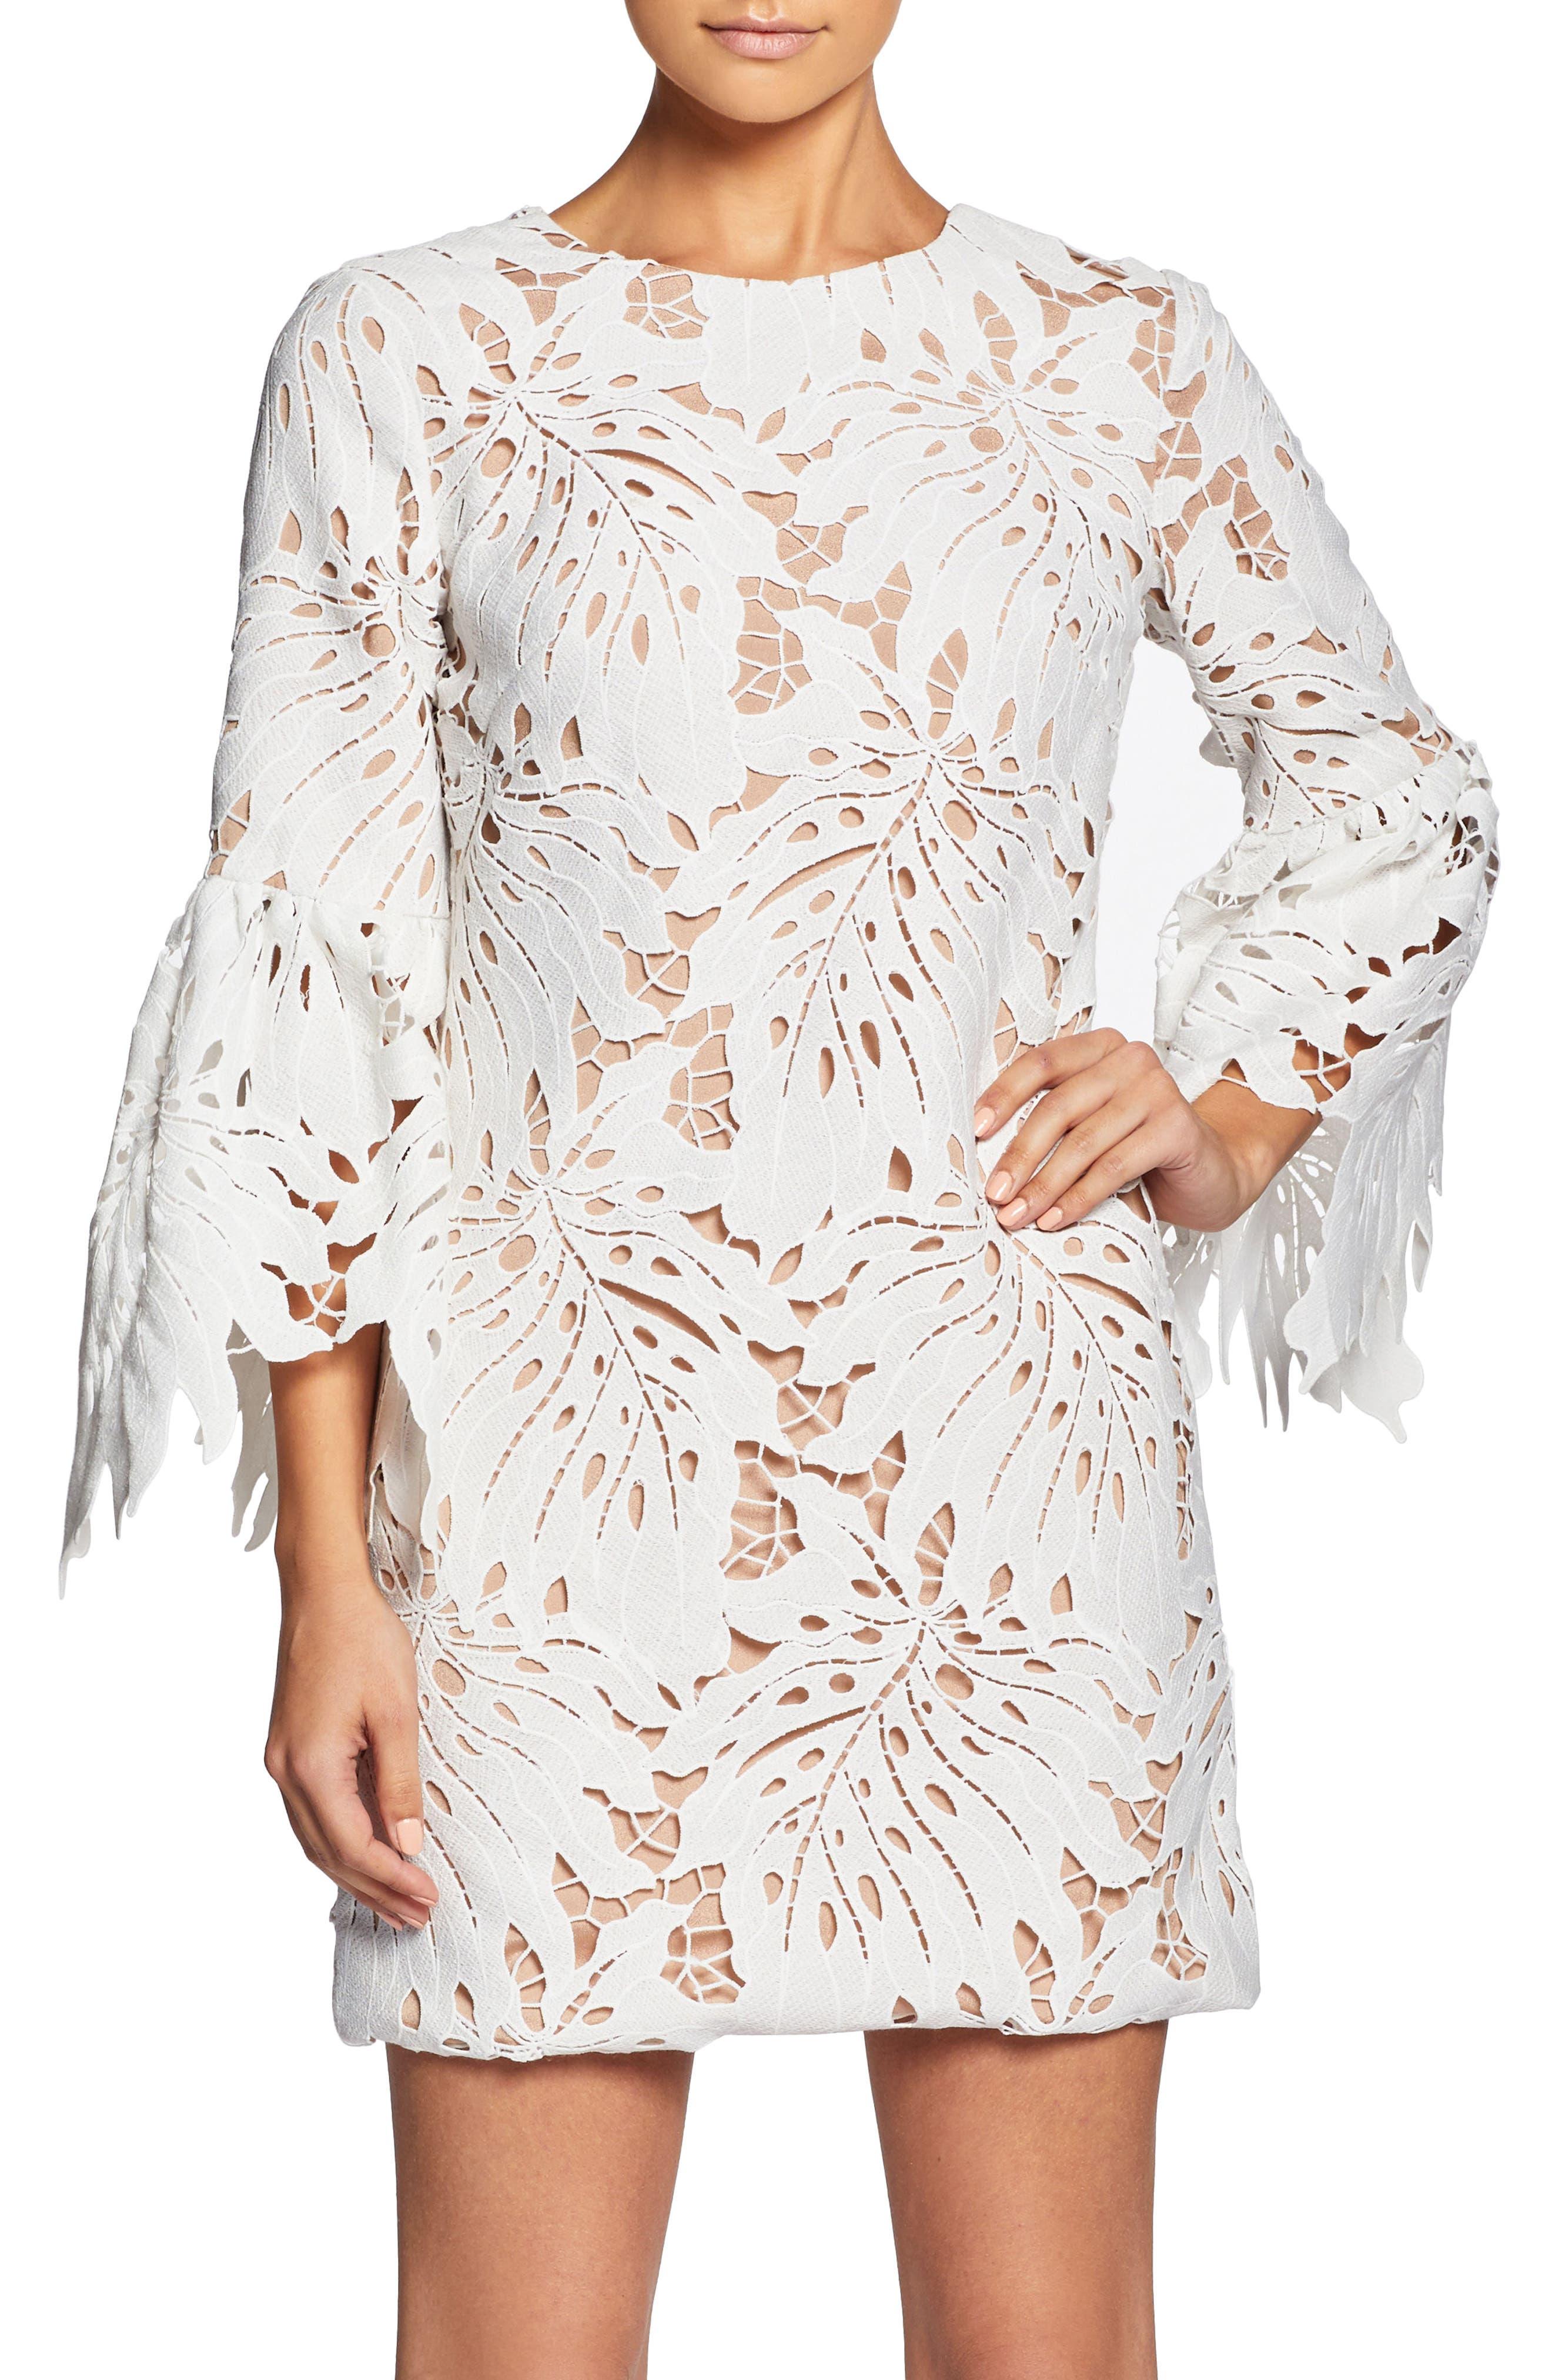 Alternate Image 1 Selected - Dress the Population Dylan Crochet Shift Dress